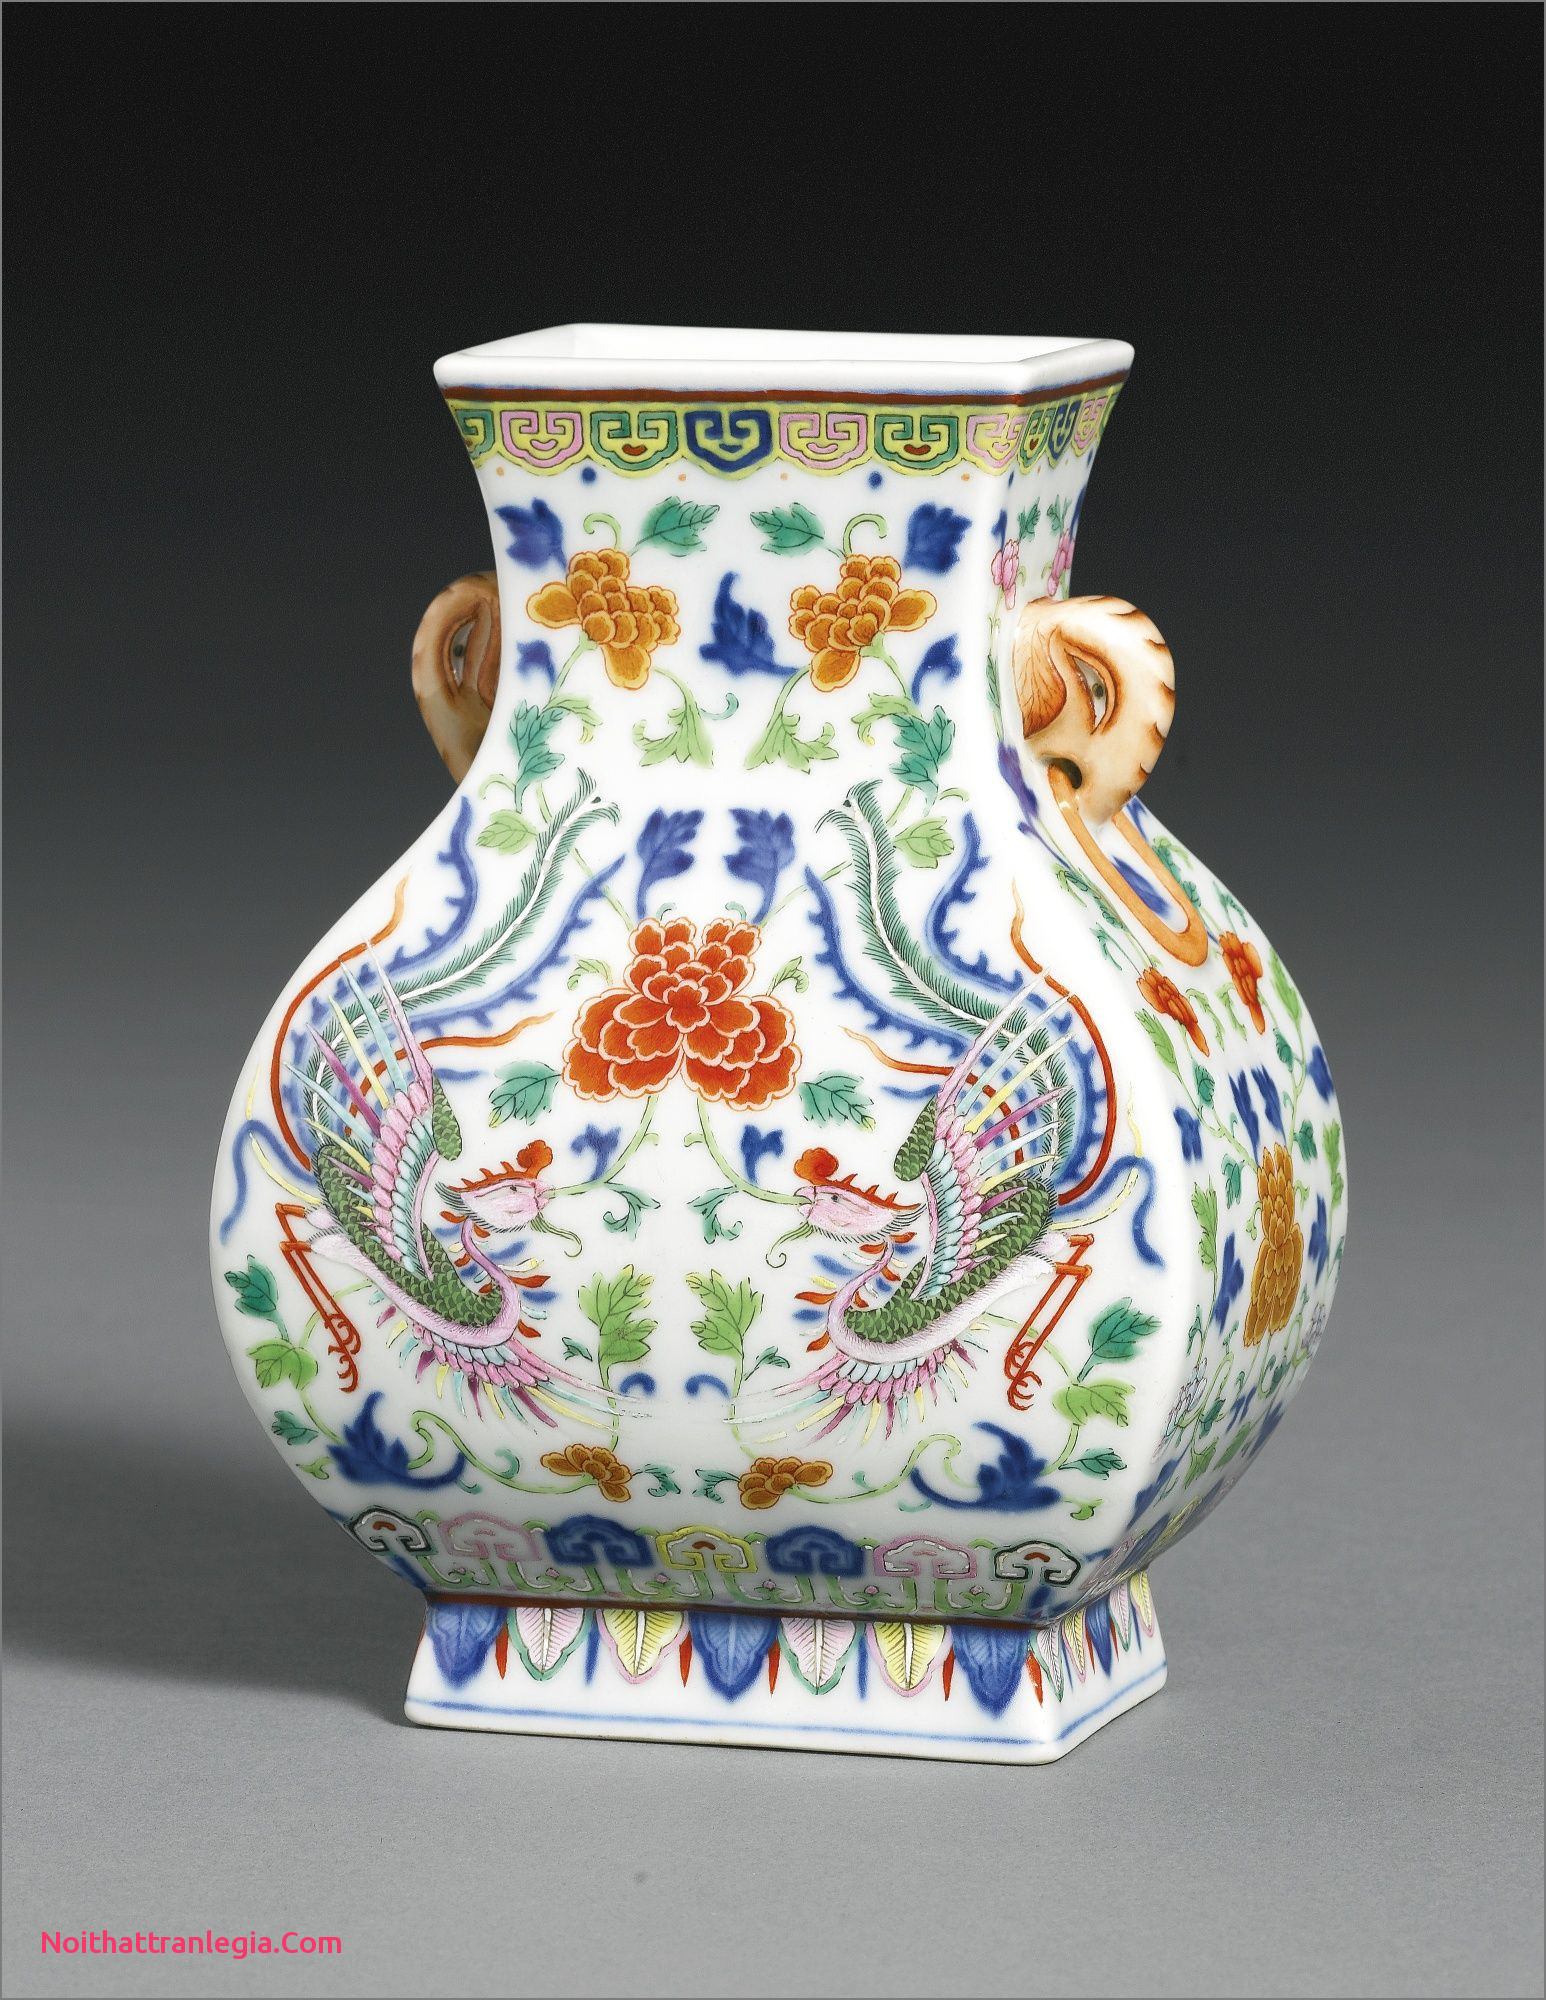 blue chinese porcelain vase of 20 chinese antique vase noithattranlegia vases design throughout a fine and rare underglaze blue polychrome enamel phoenix vase fangu qianlong seal mark and period